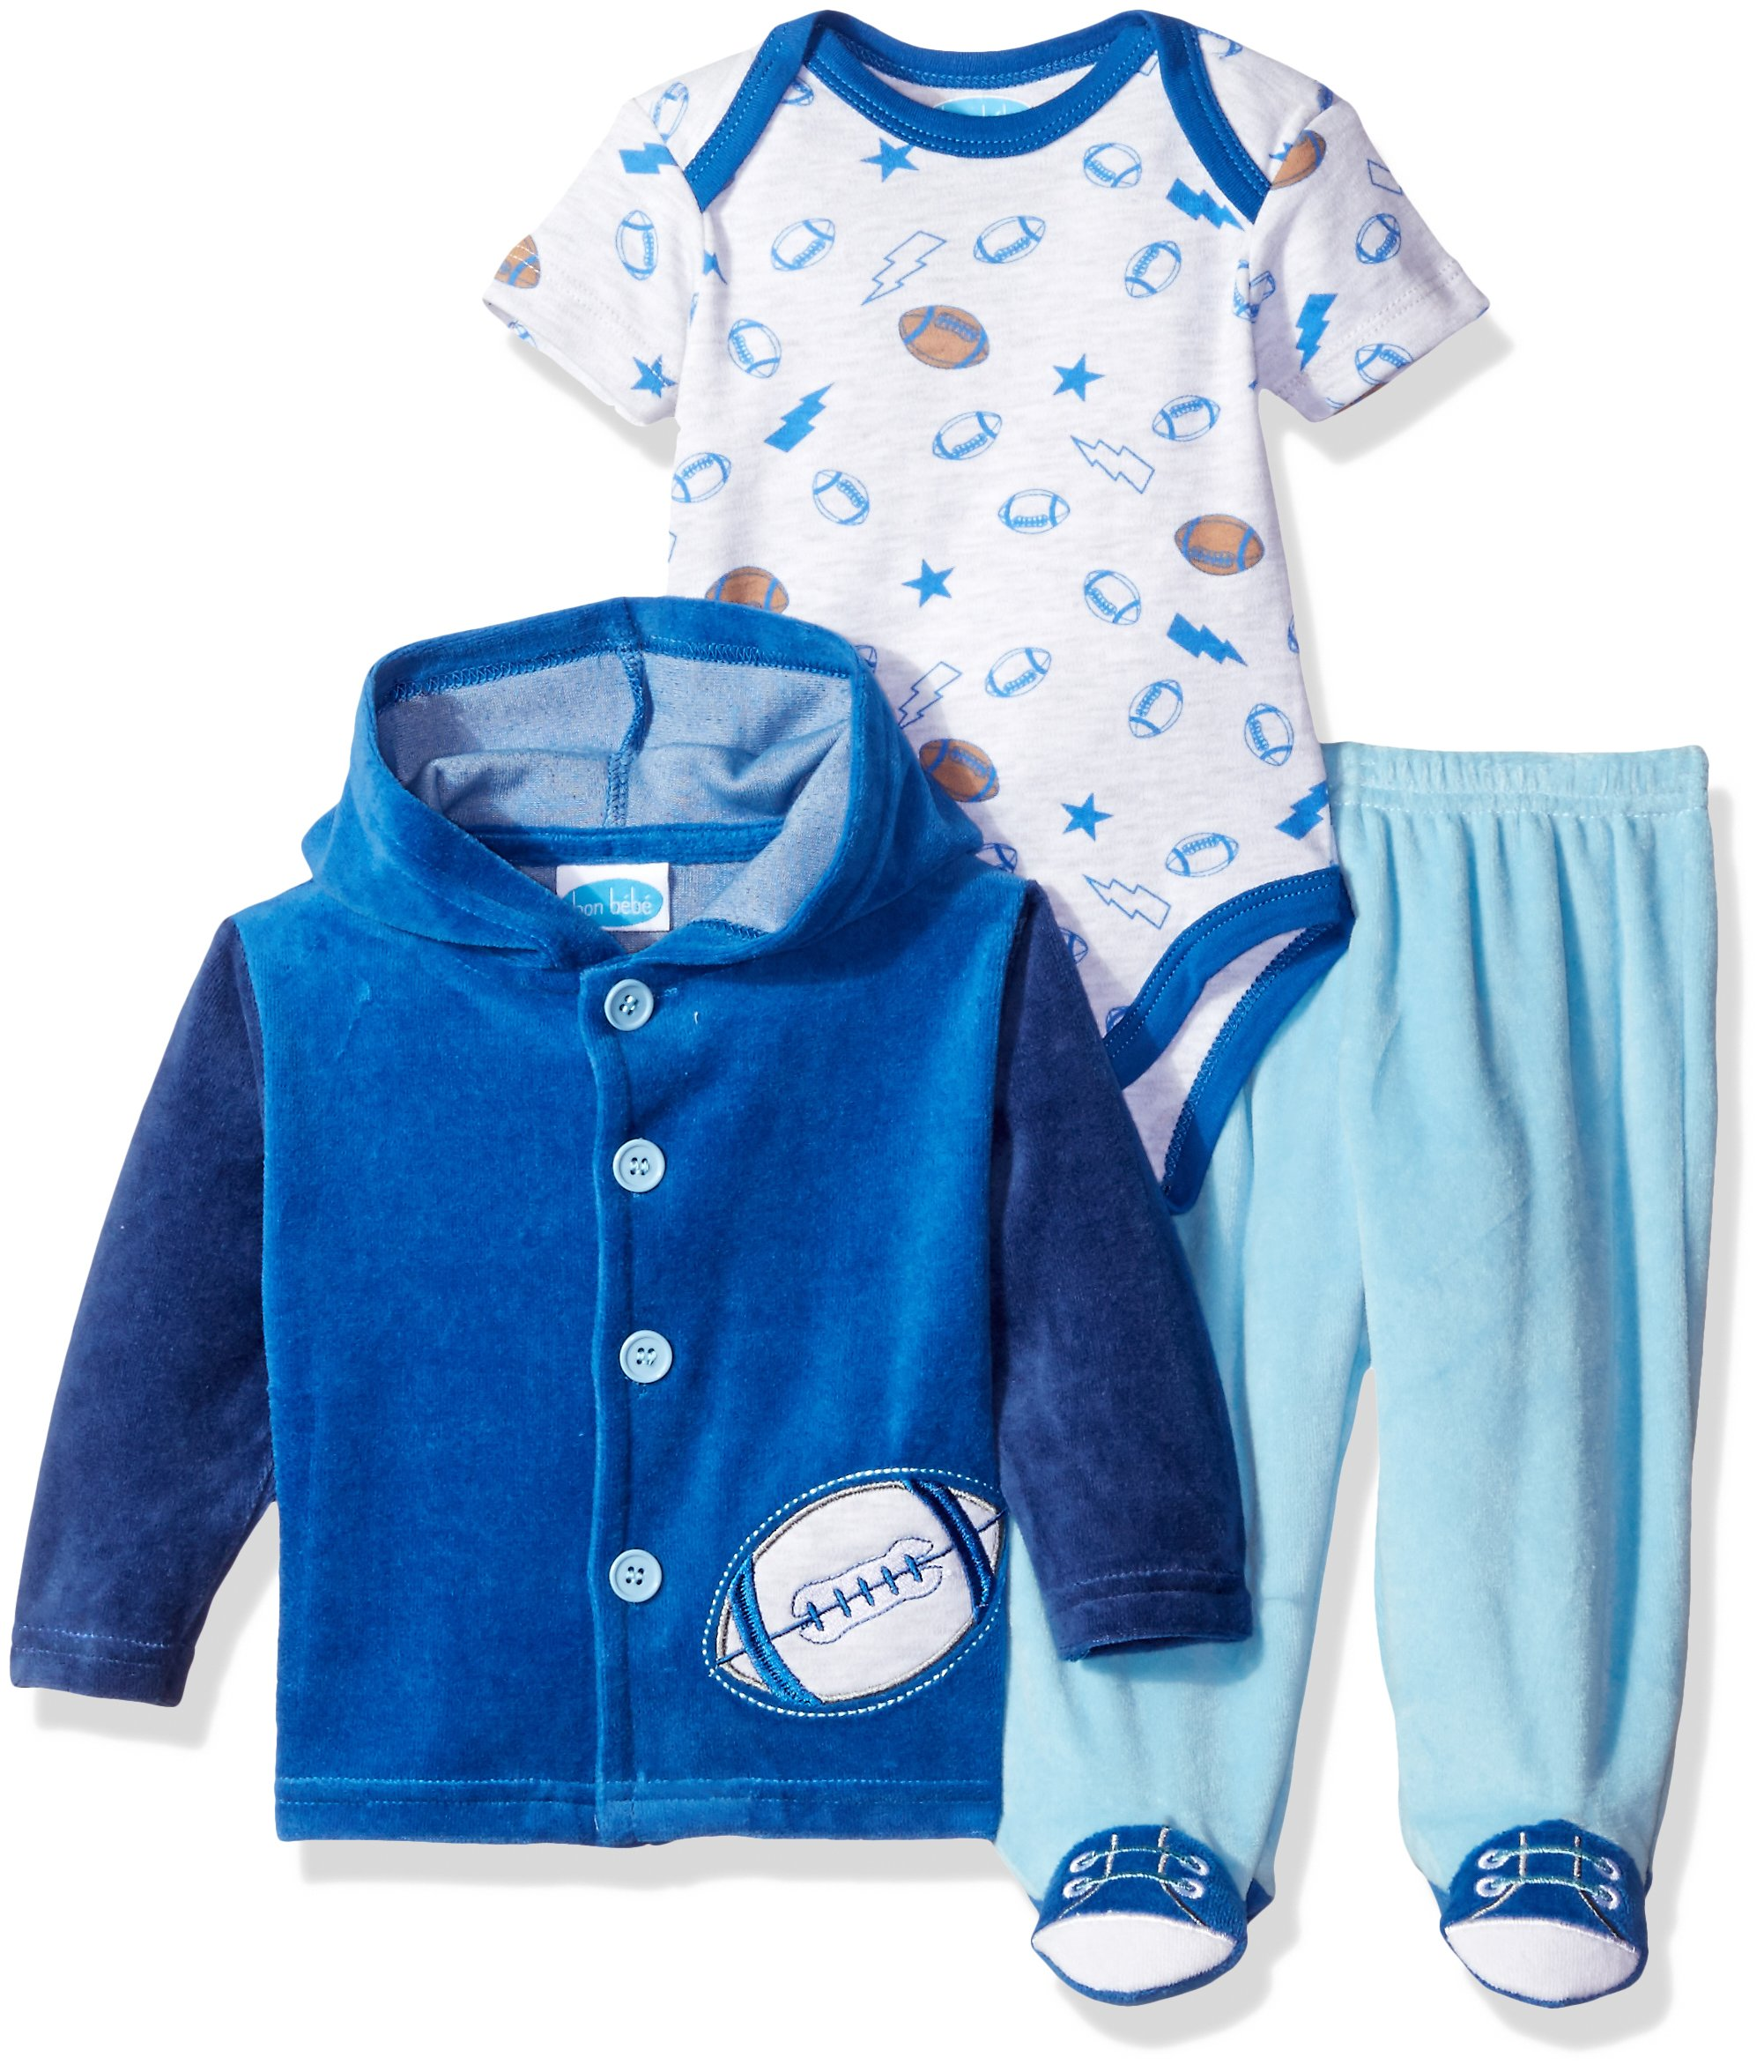 Bon Bebe Baby Boys' 3 Piece Velour Jacket Set with